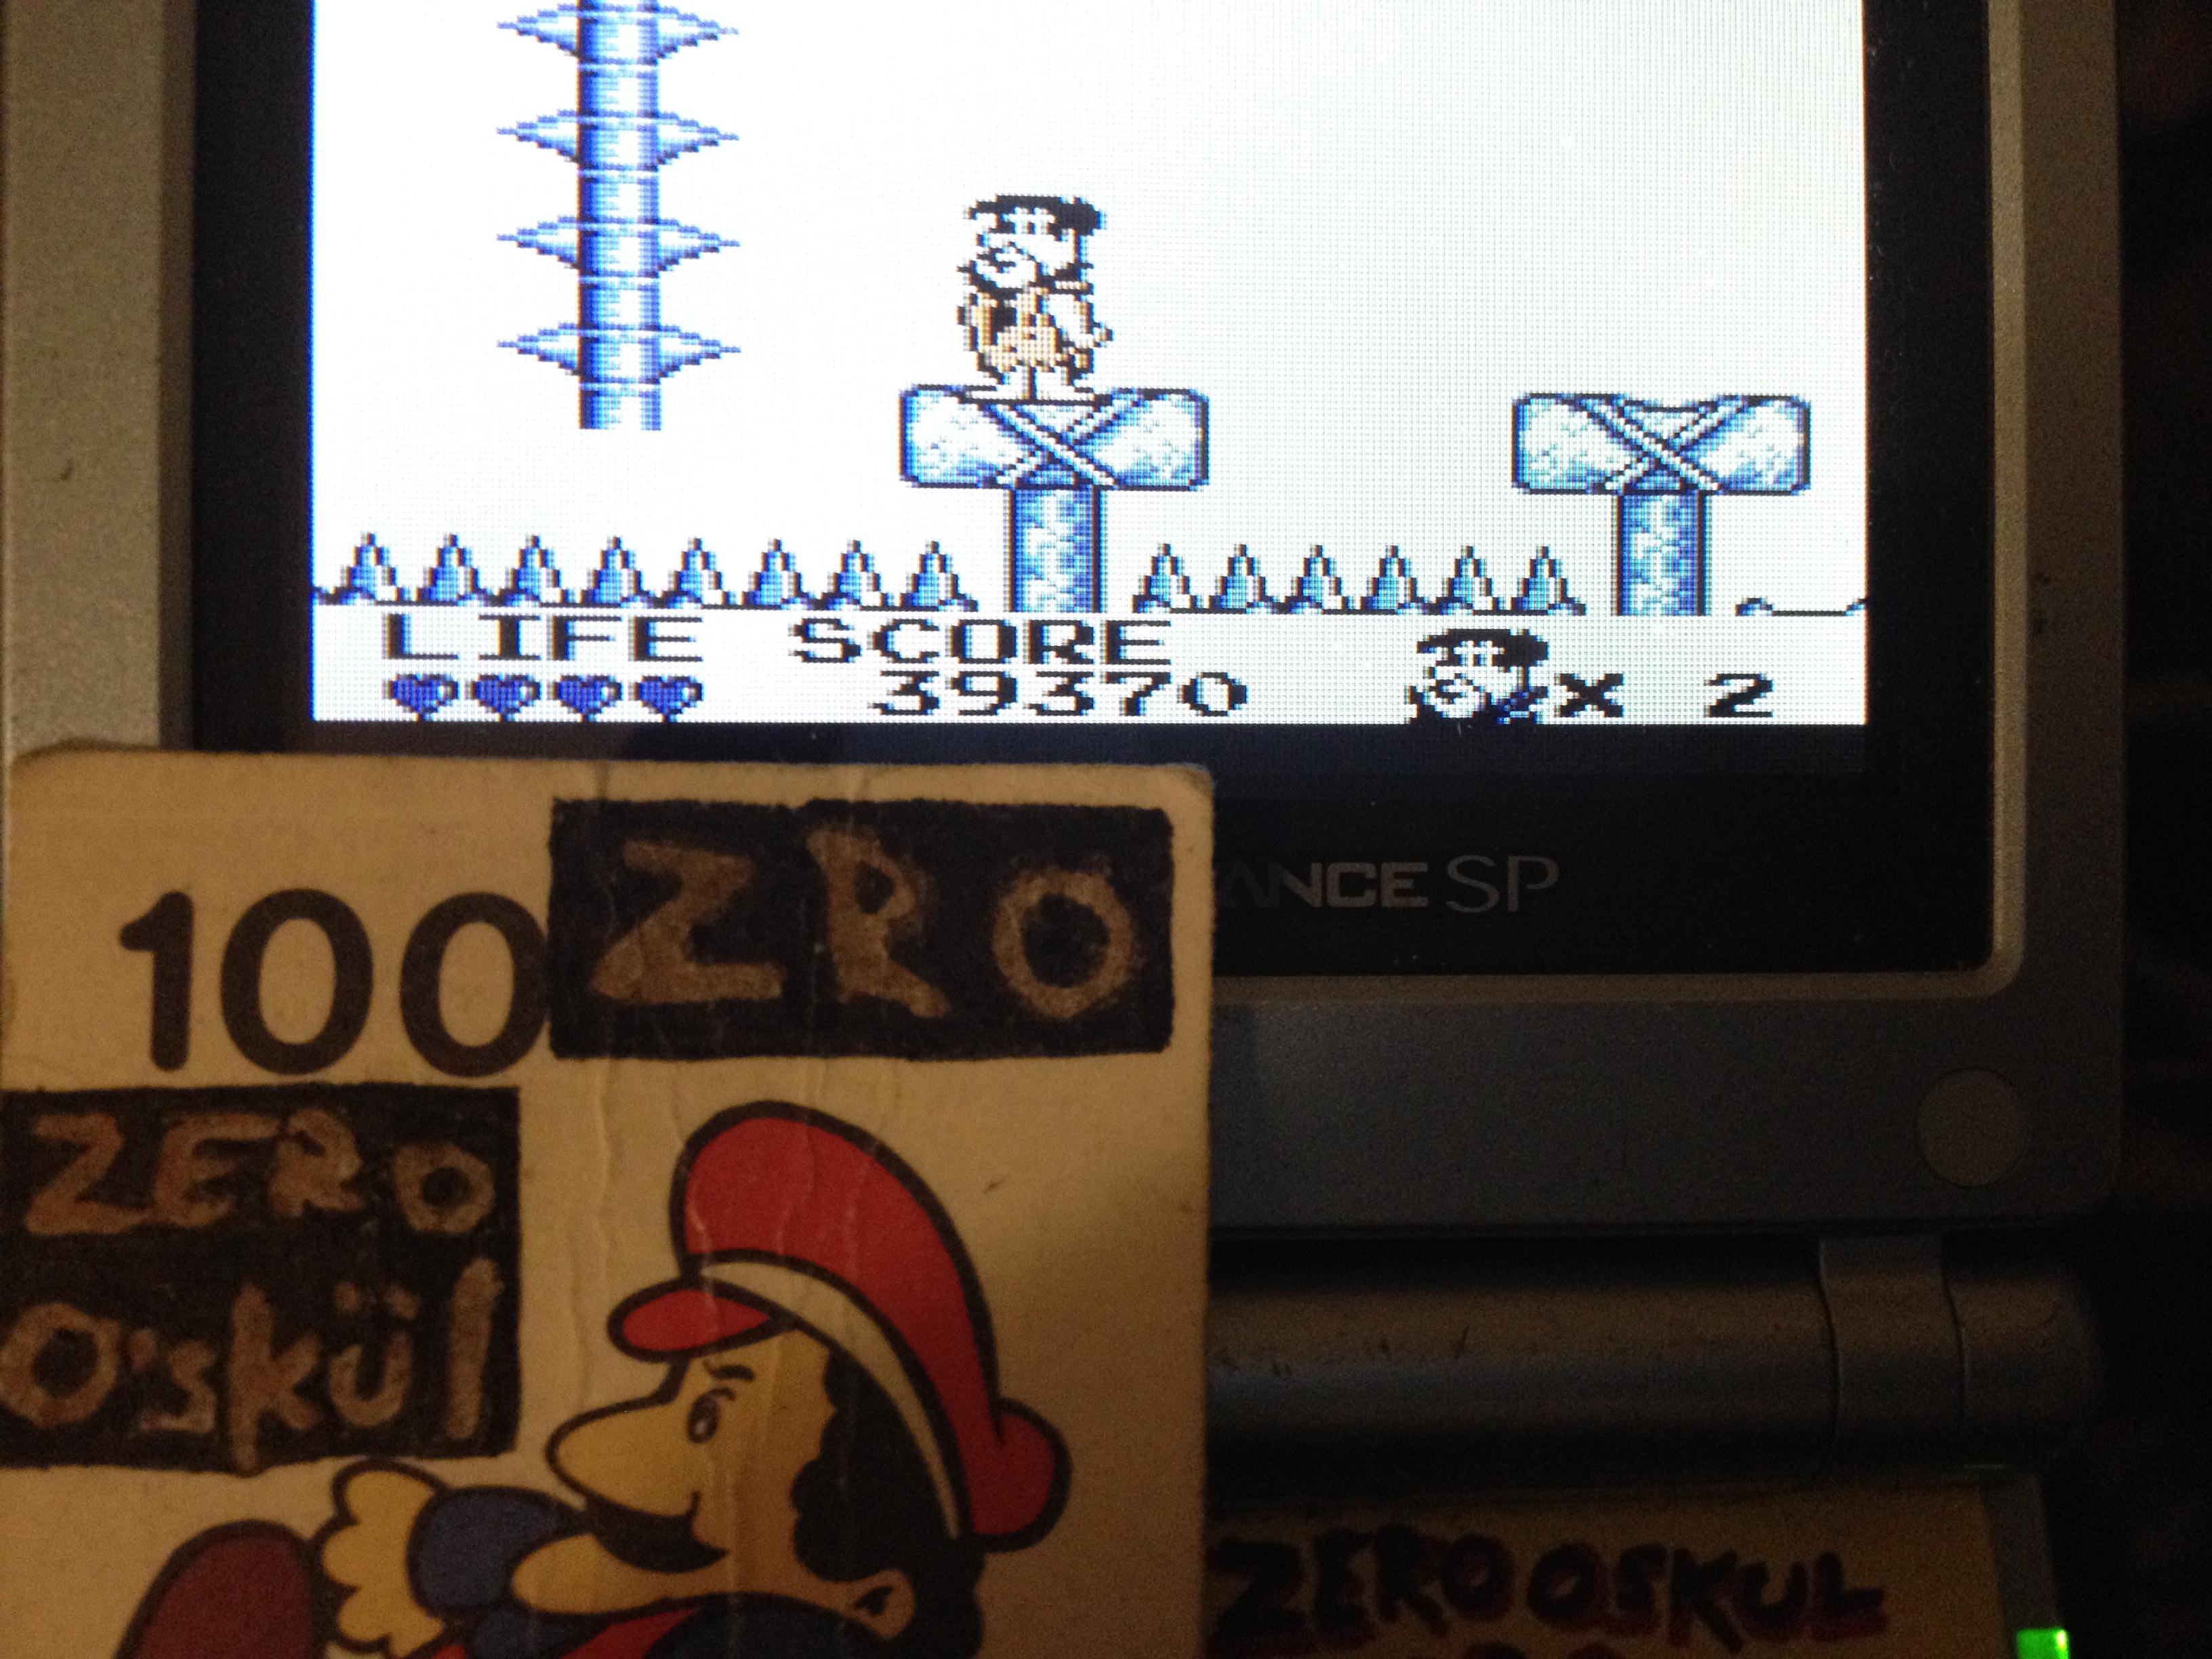 zerooskul: The Flintstones: King Rock Treasure Island (Game Boy) 39,370 points on 2019-05-09 00:16:56